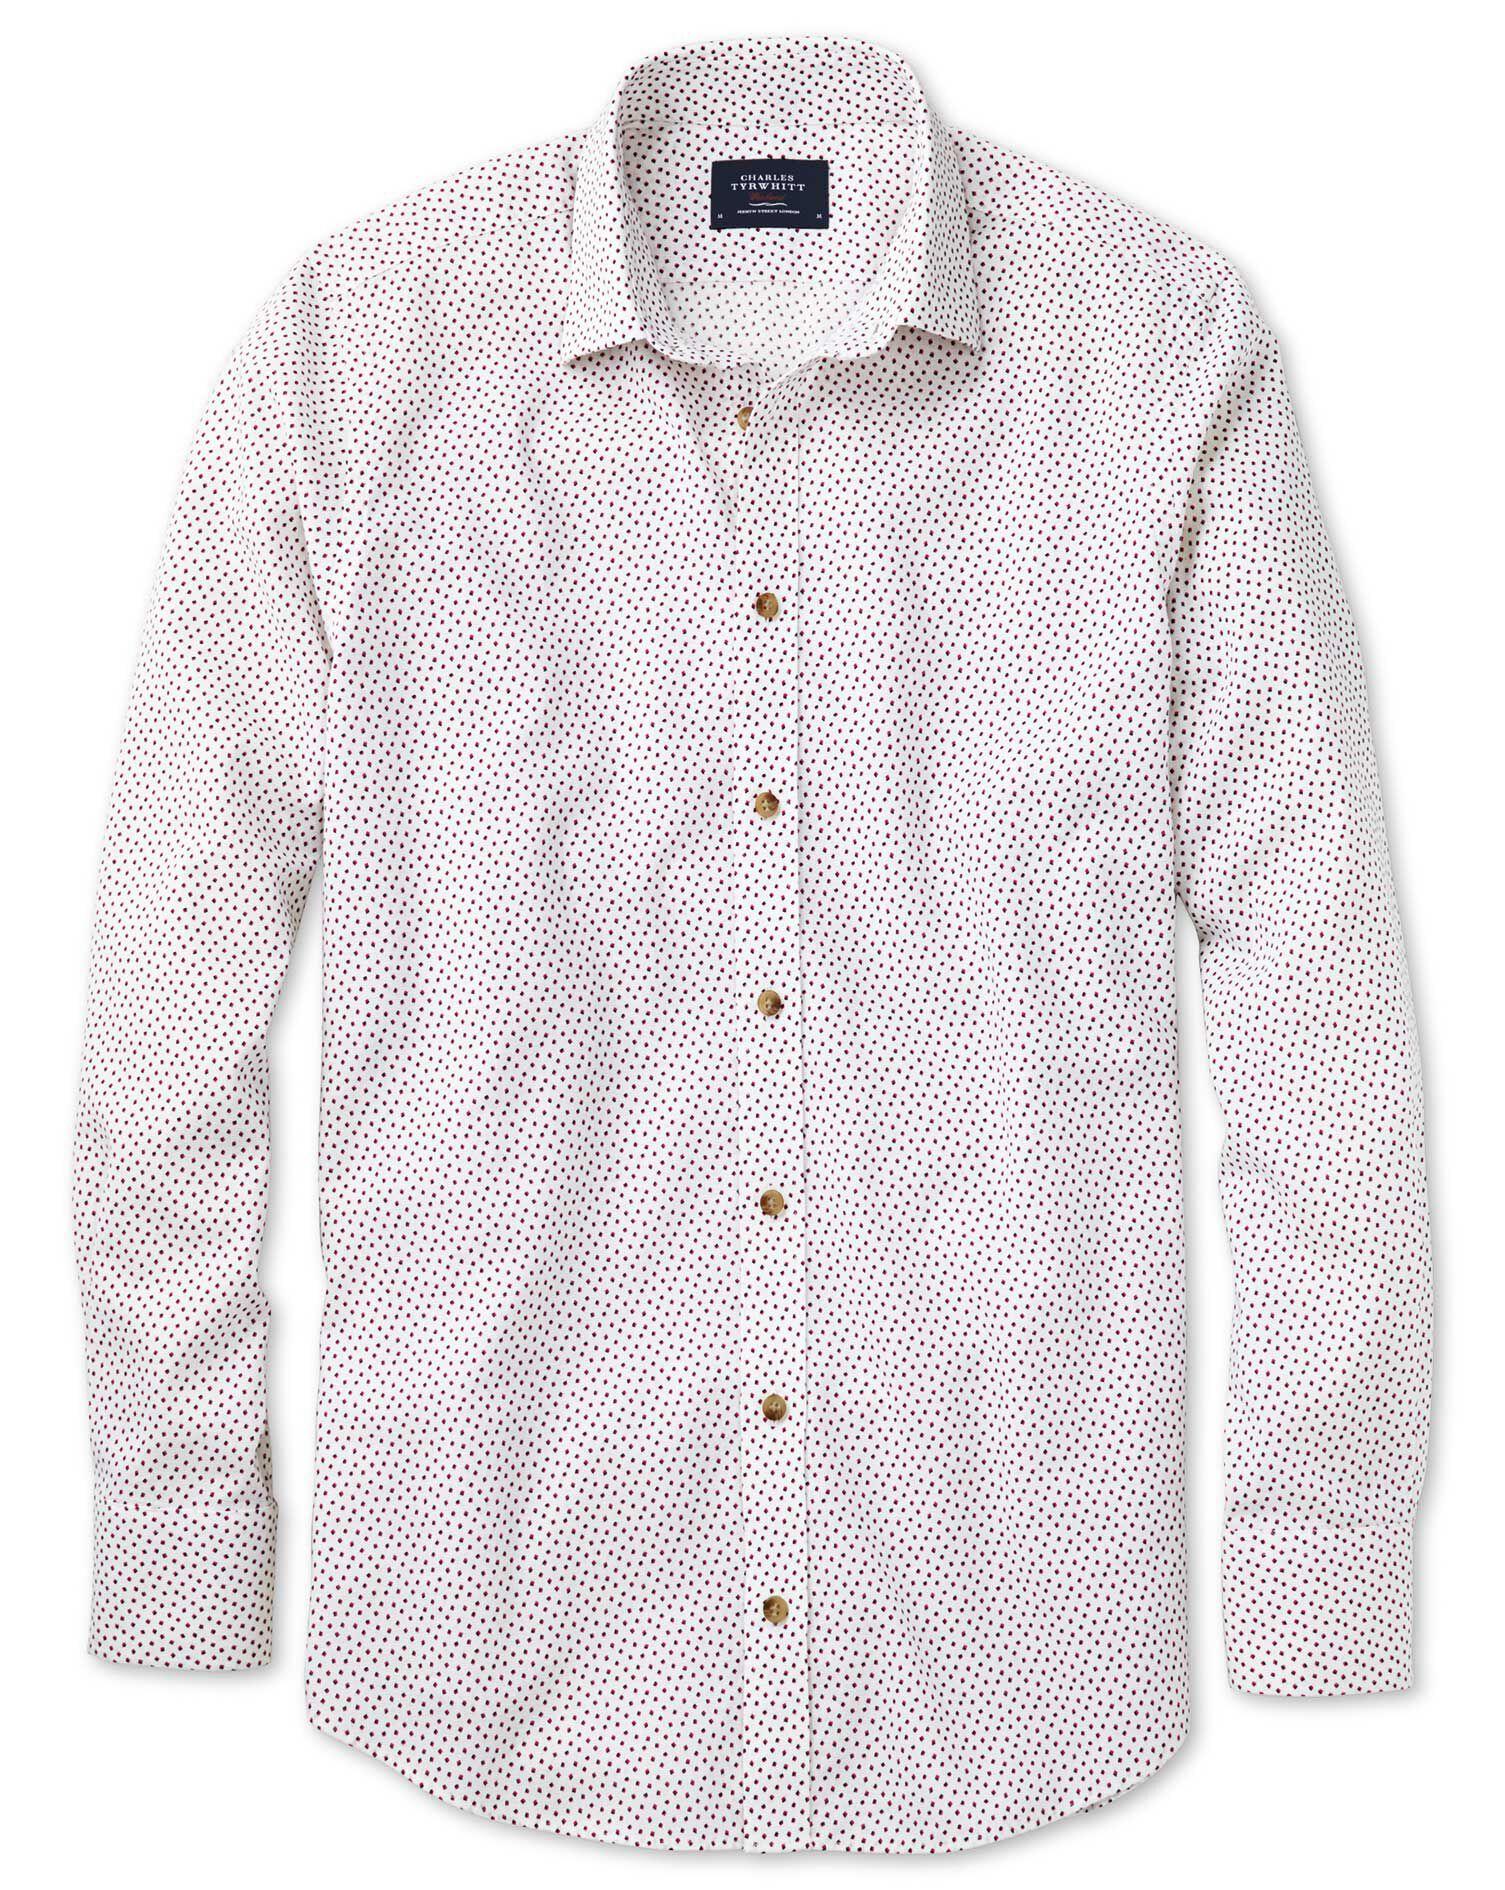 Slim Fit White and Pink Square Print Shirt Single Cuff Size Medium by Charles Tyrwhitt